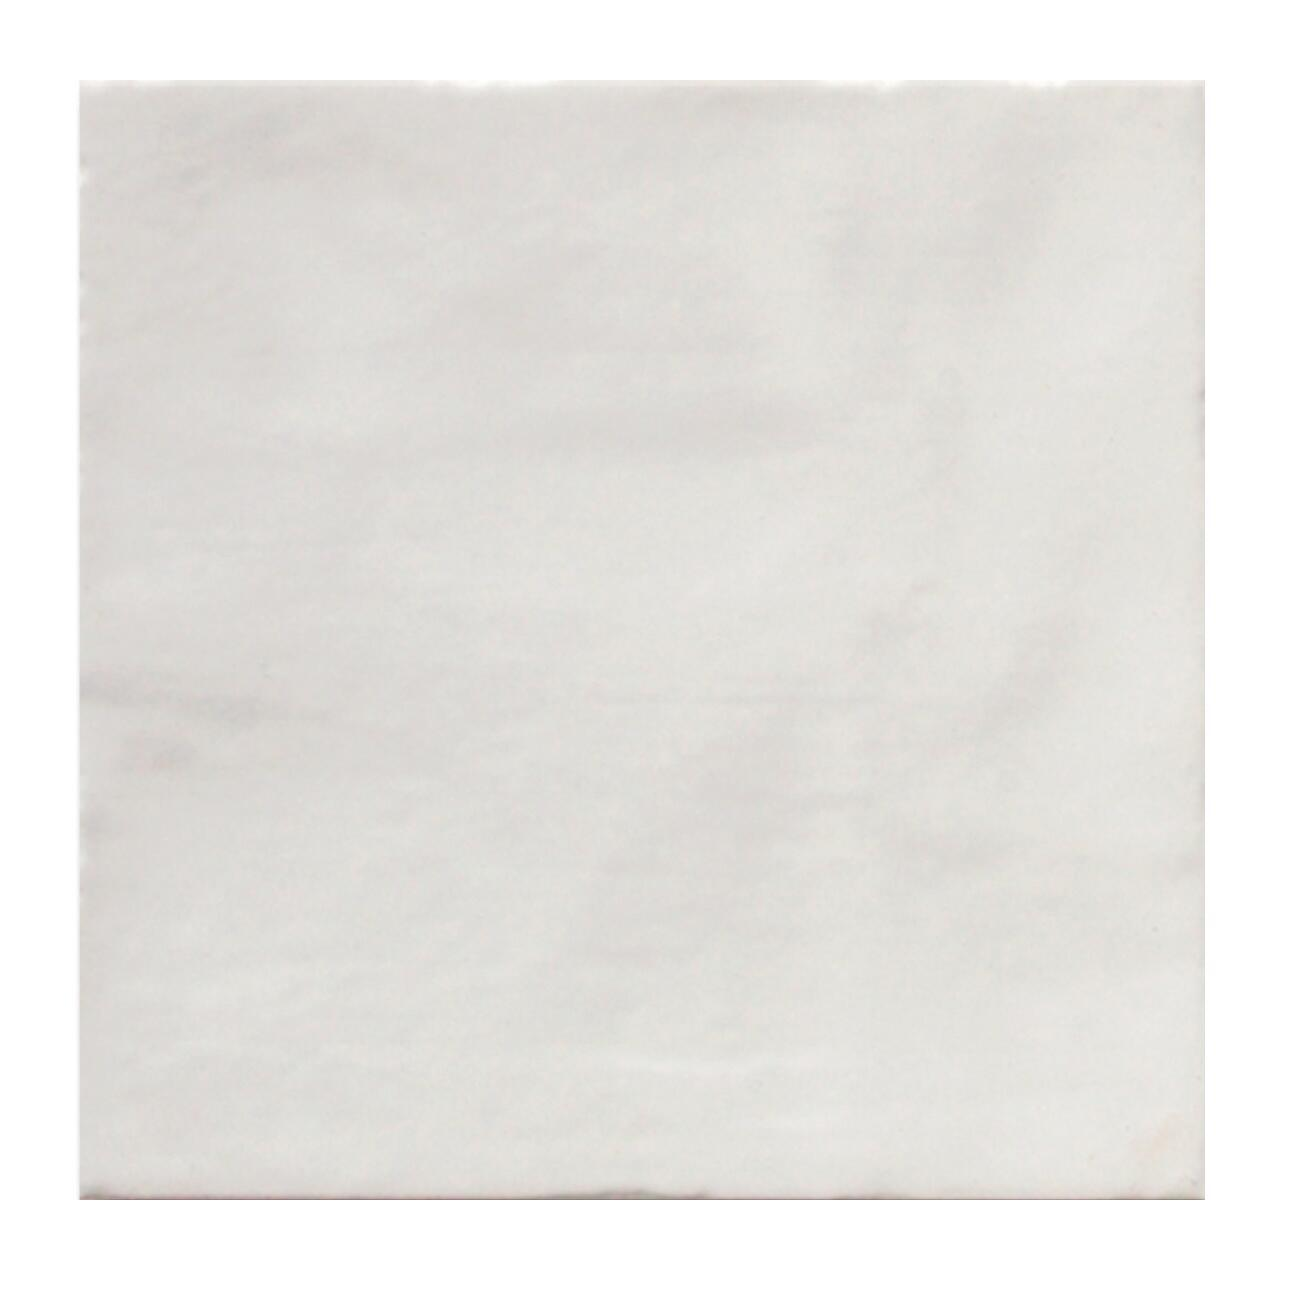 Piastrella per rivestimenti Patine 15 x 15 cm sp. 7 mm bianco - 2